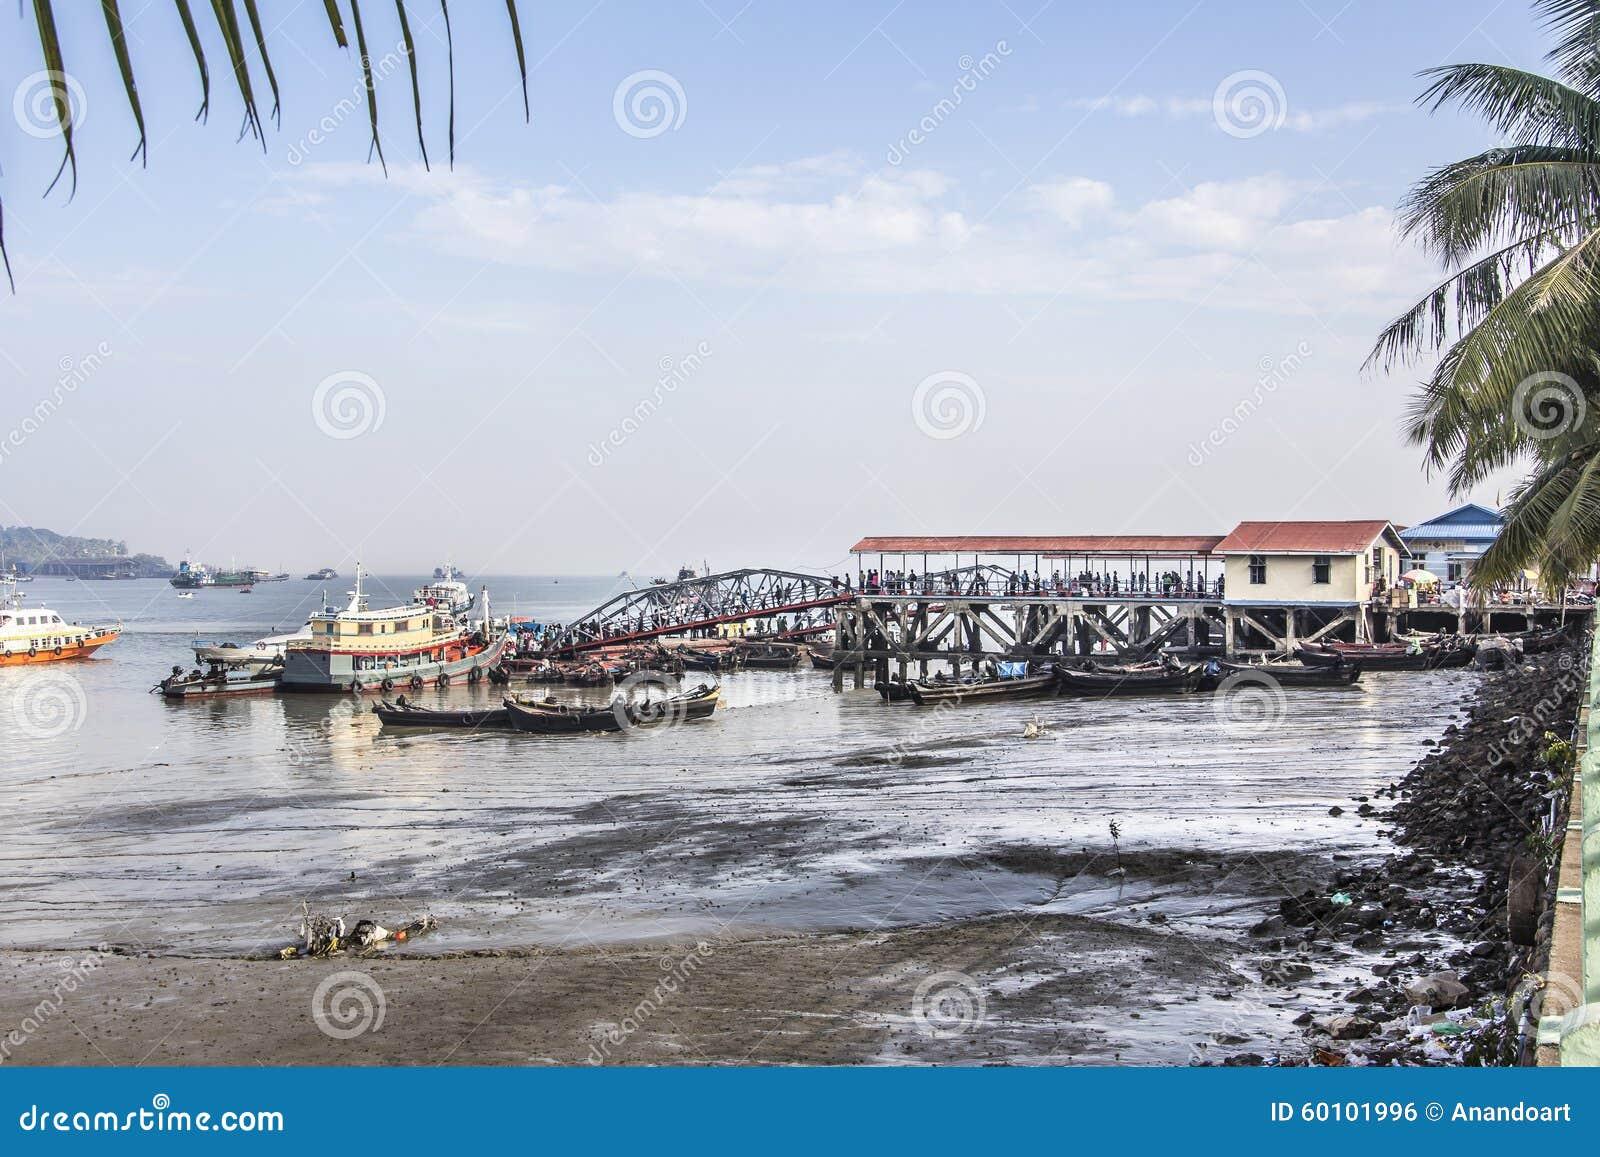 Myeik jetty editorial photo  Image of burma, dock, boat